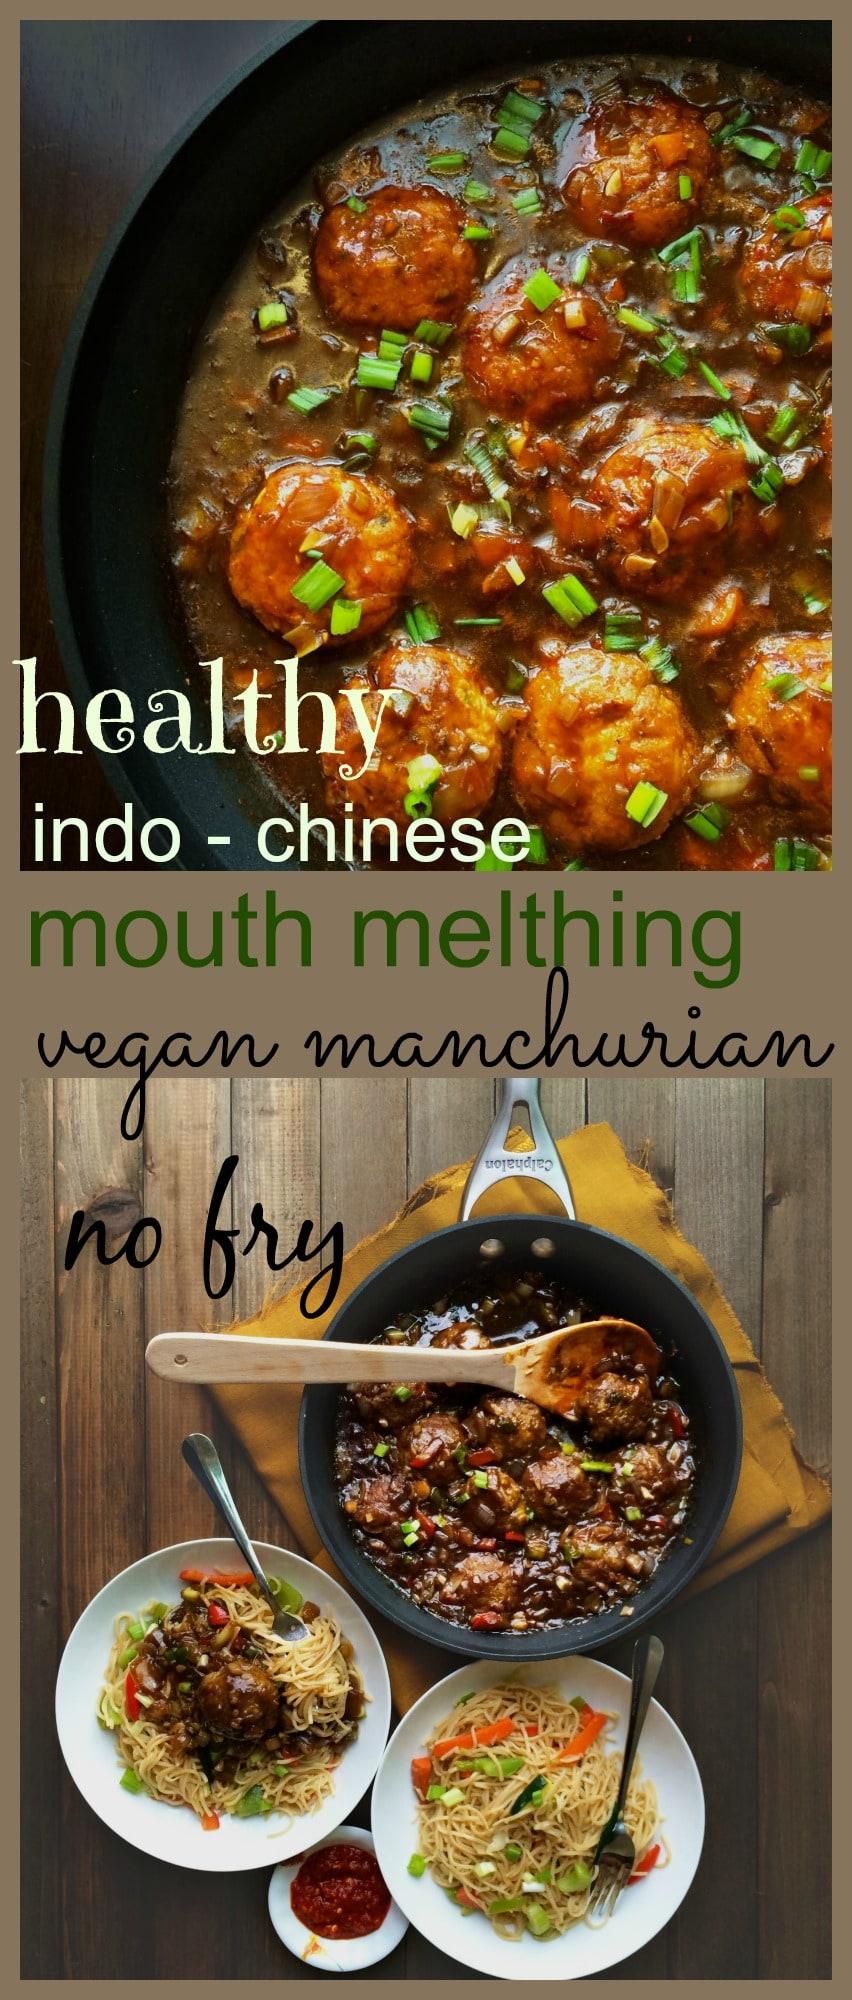 vegan healthy veg manchurian -no fry